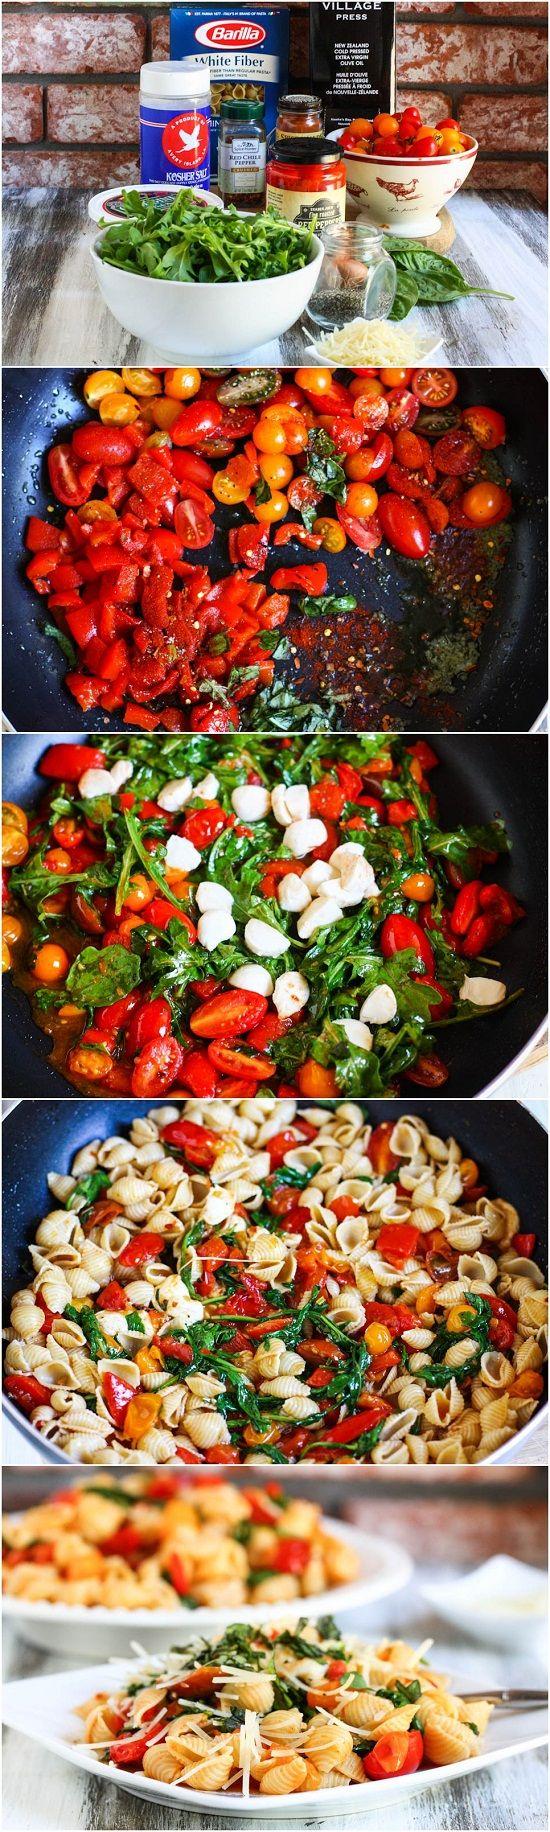 Tomato, Roasted Pepper and Arugula Pasta...looks pretty good!